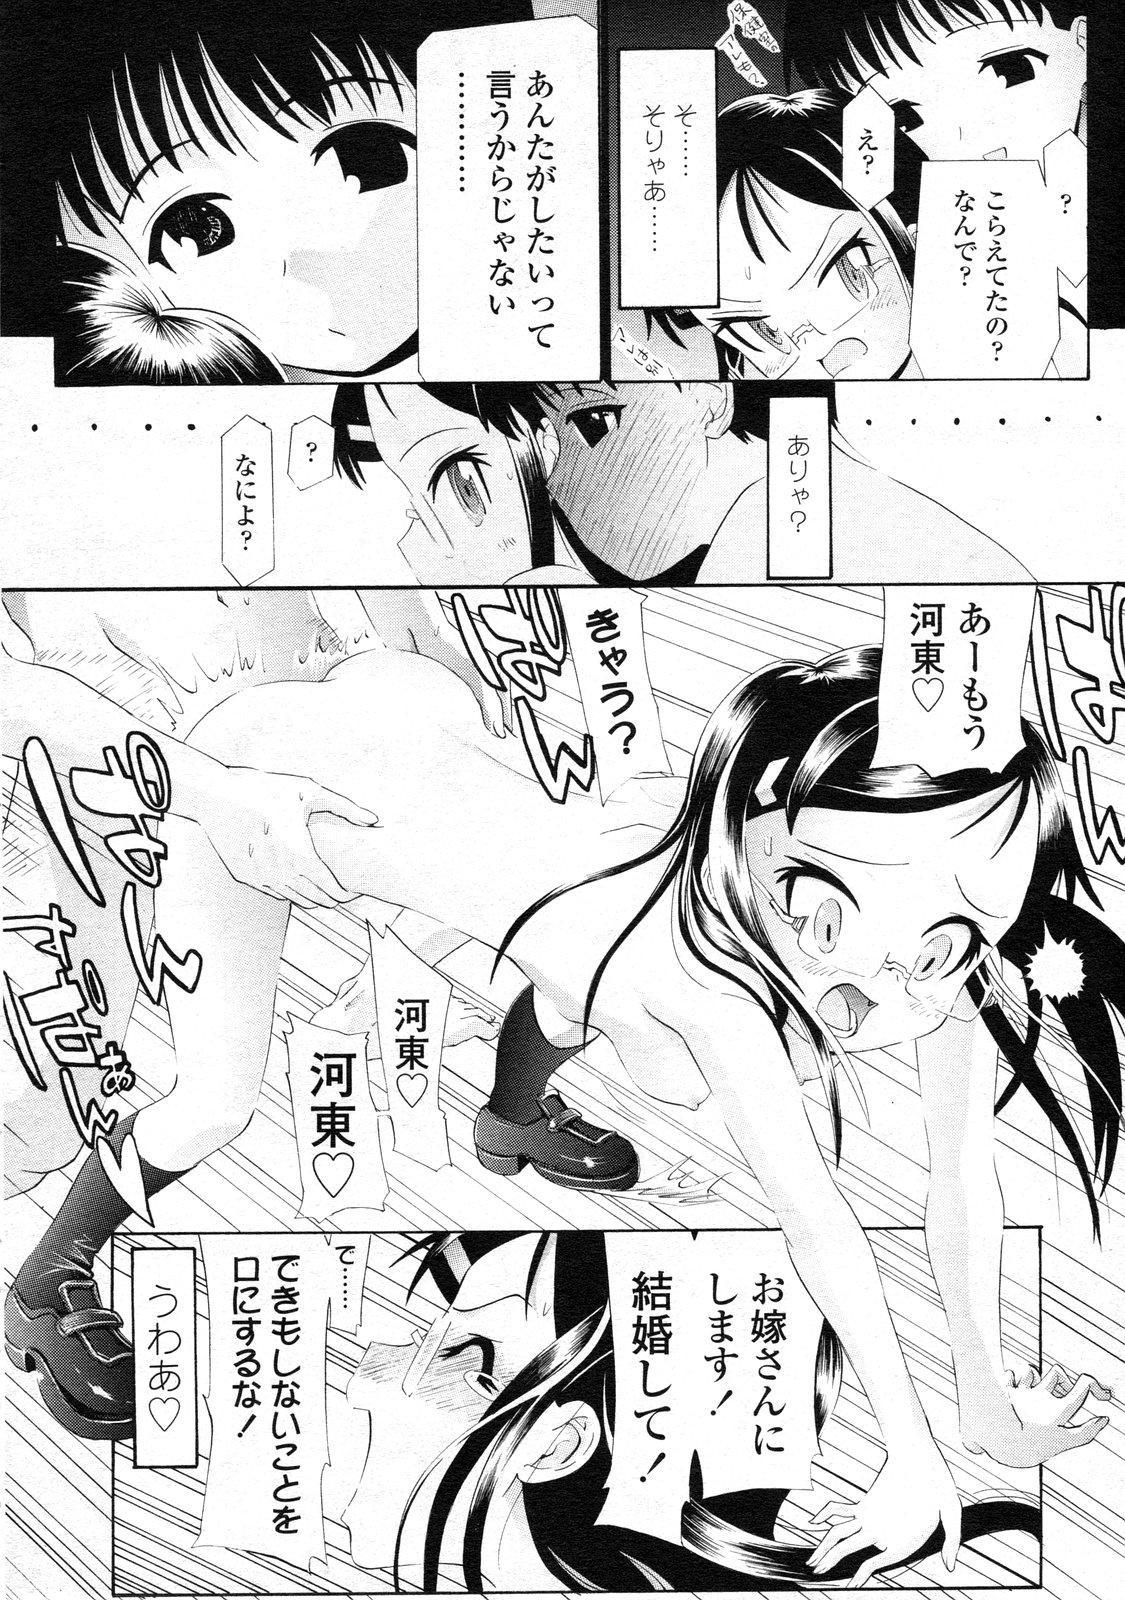 COMIC LO 2009-09 Vol. 66 352